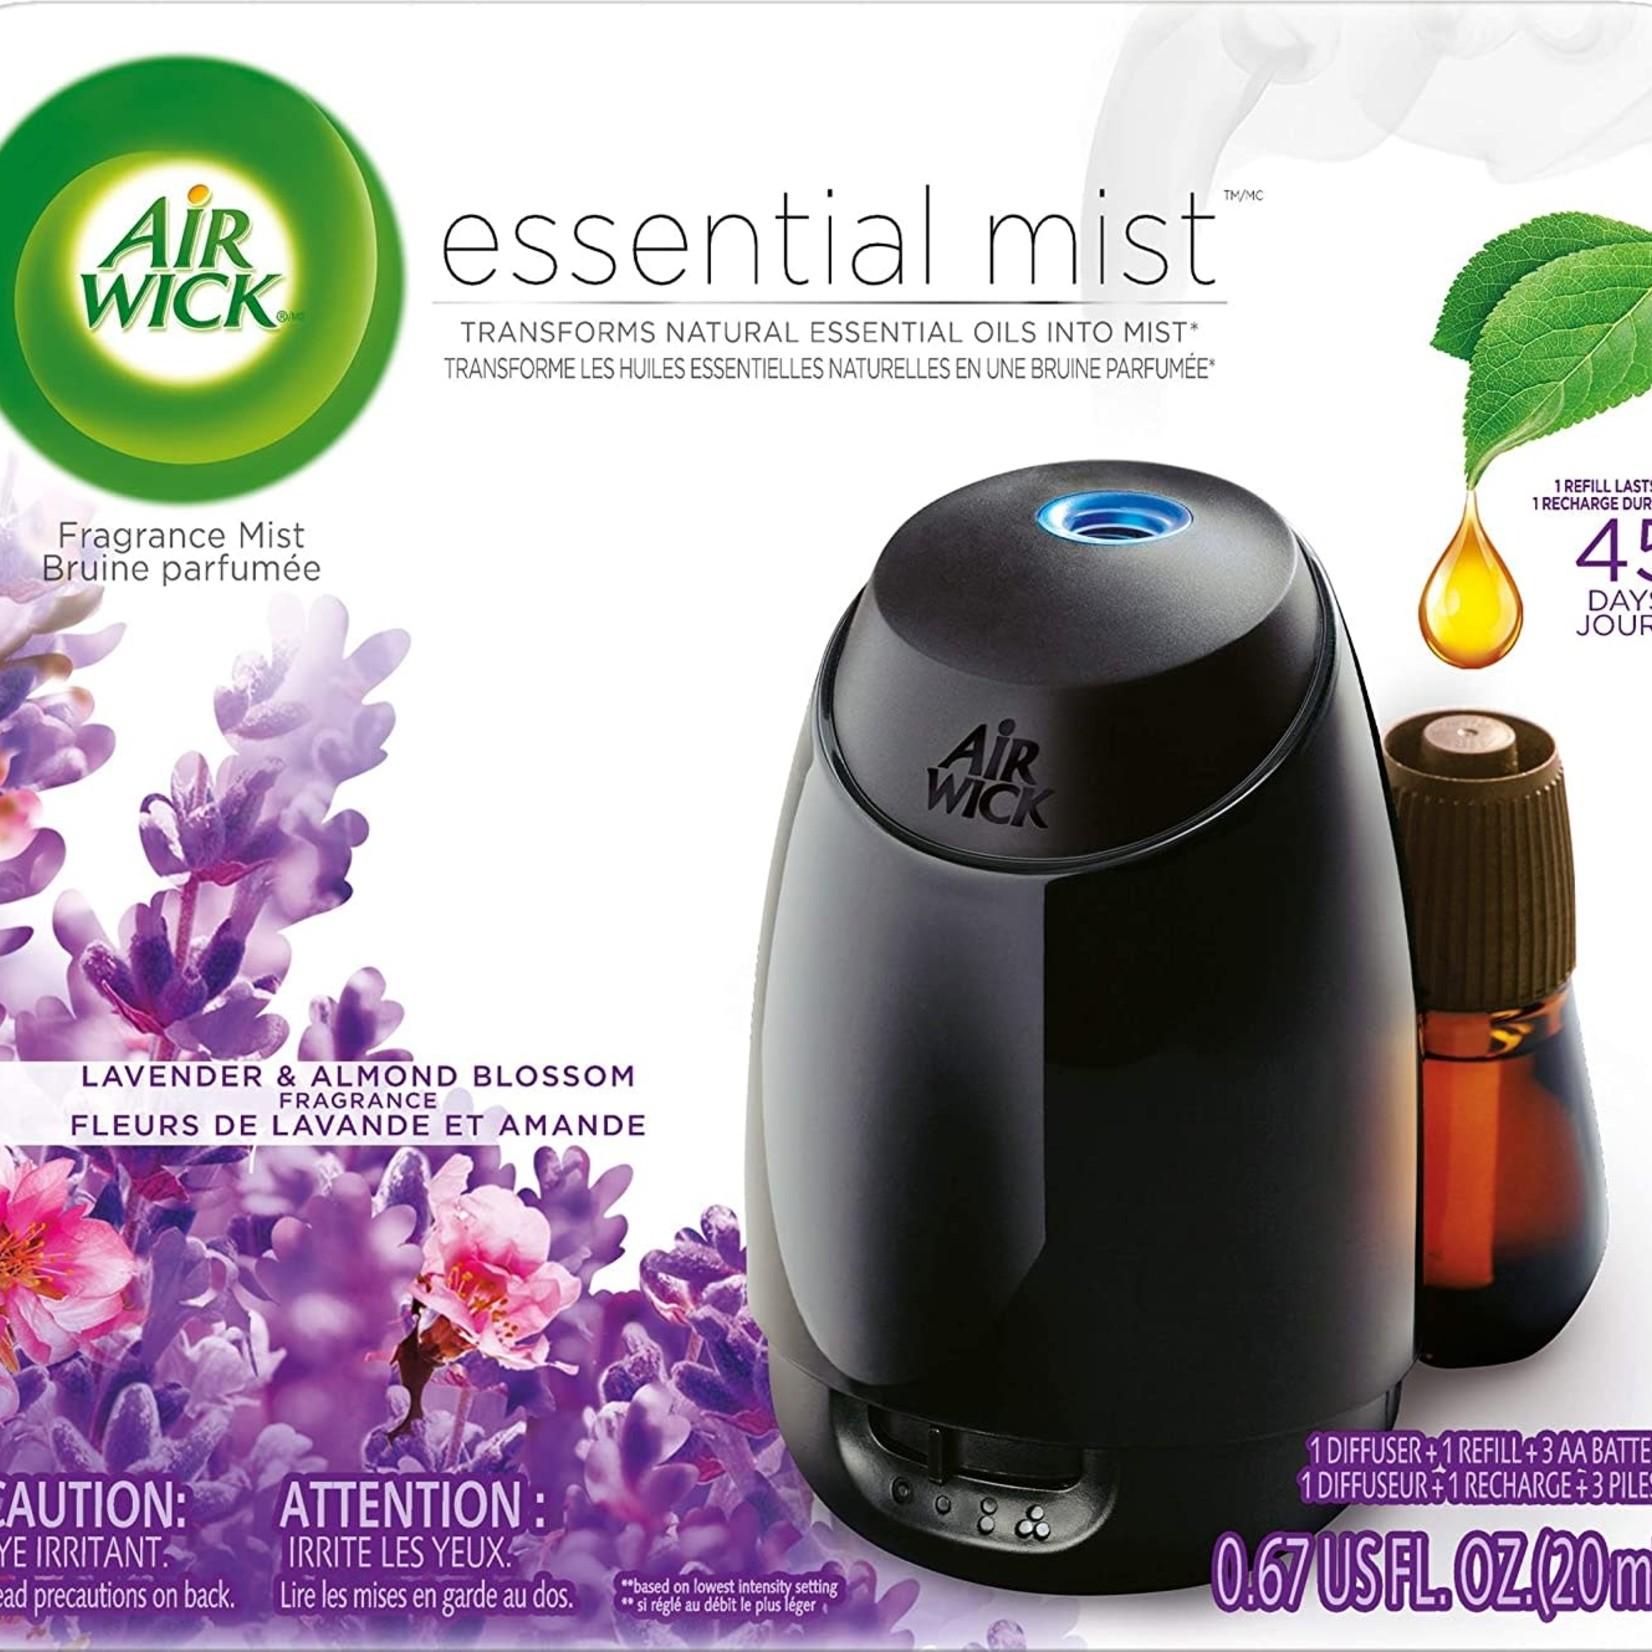 Air Wick Essential Mist Lavender & Almond Blossom Air Freshener